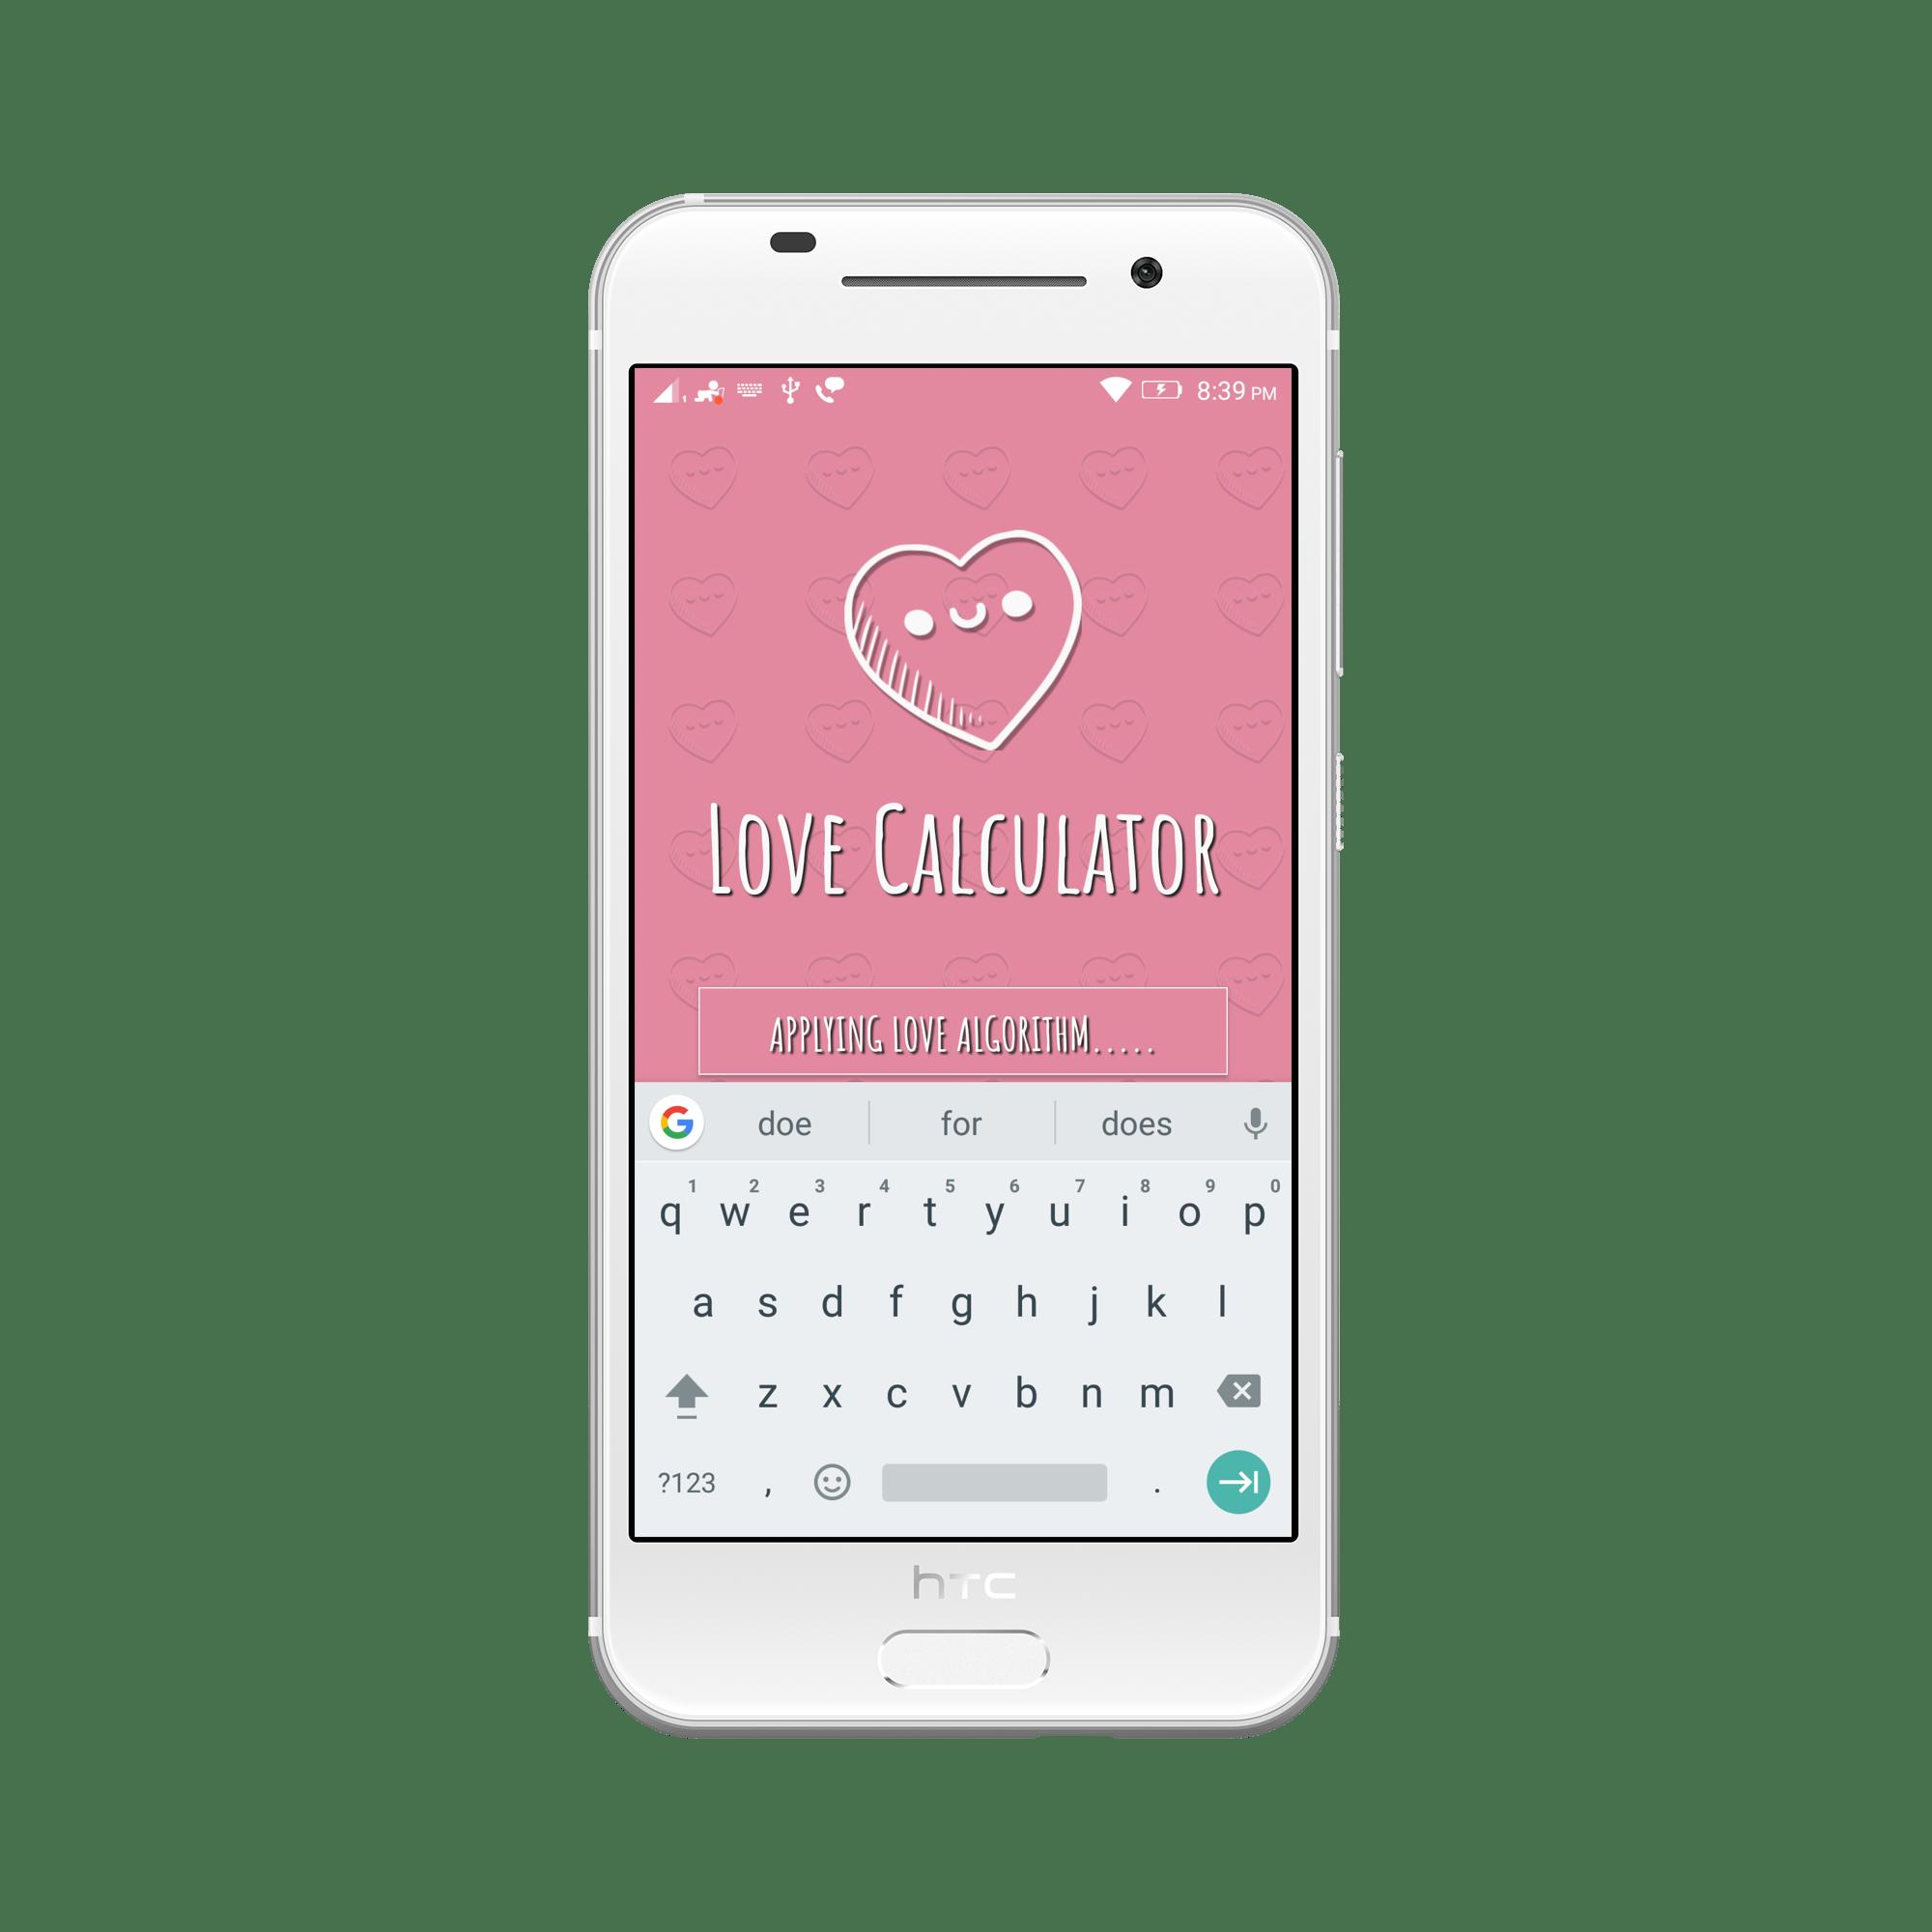 Uncategorized Love Caluclator love calculator best choice by kishord codecanyon choice